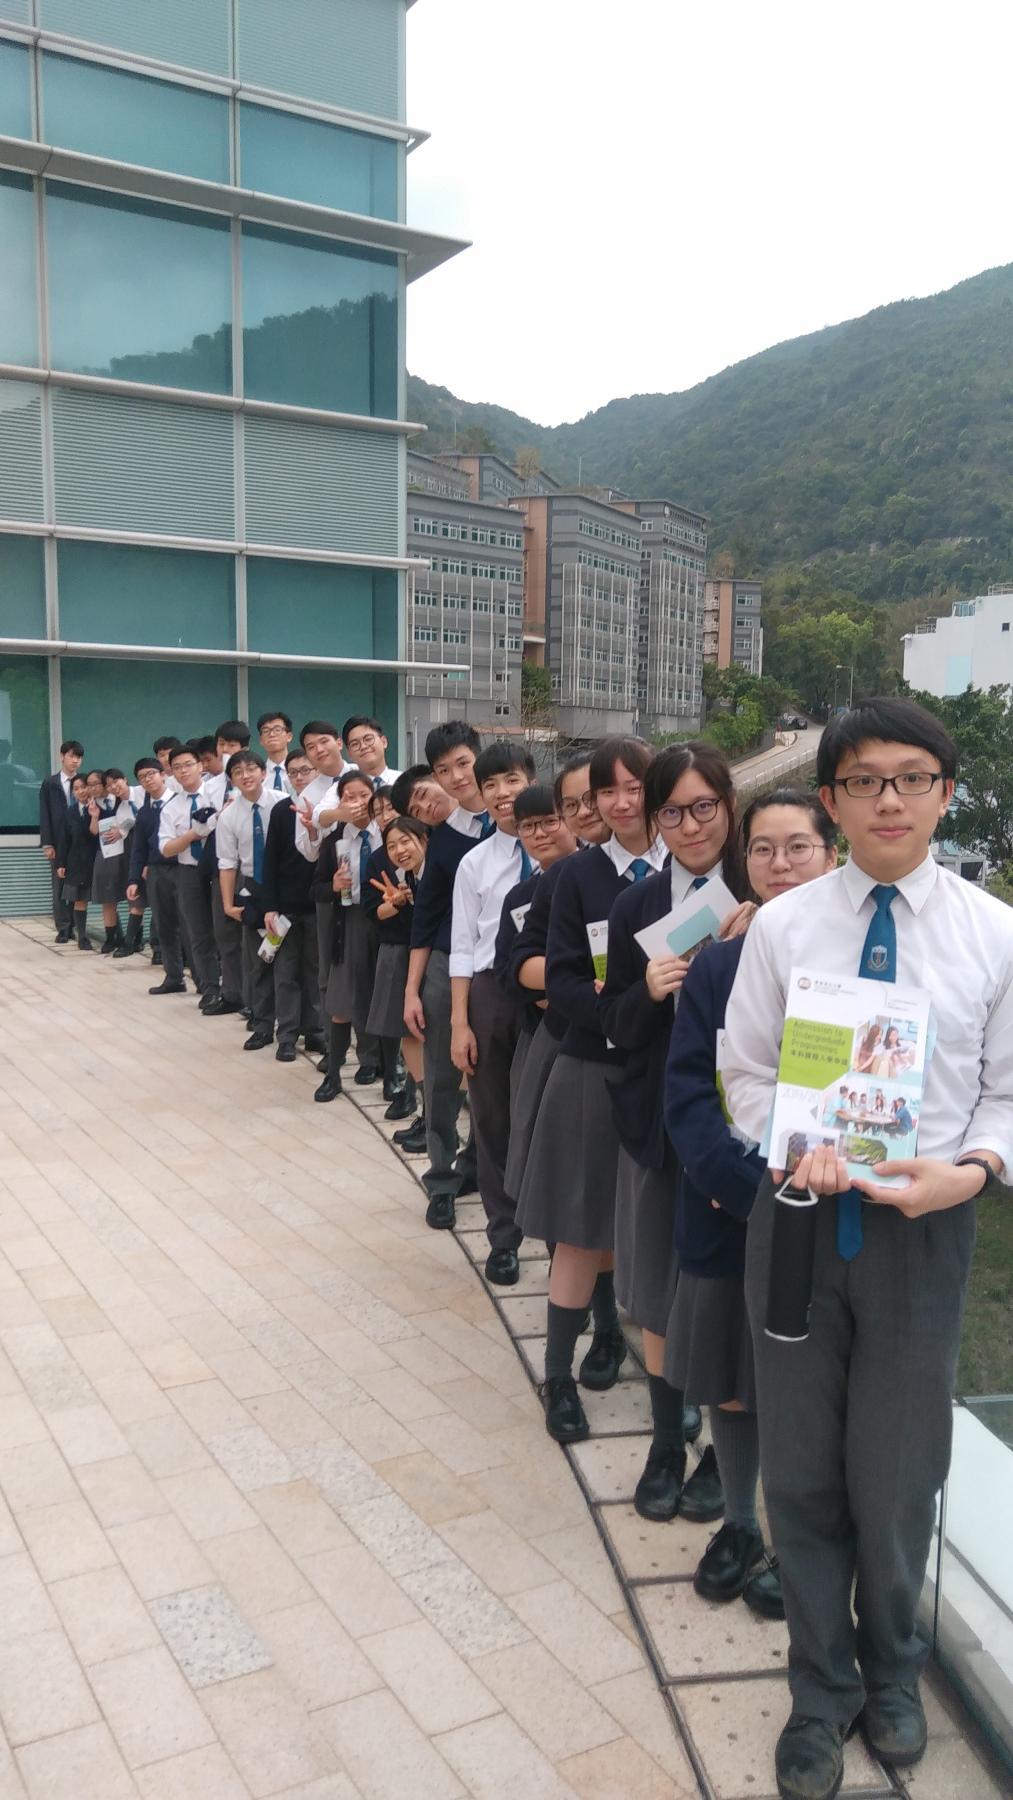 http://npc.edu.hk/sites/default/files/20190329_164242.jpg